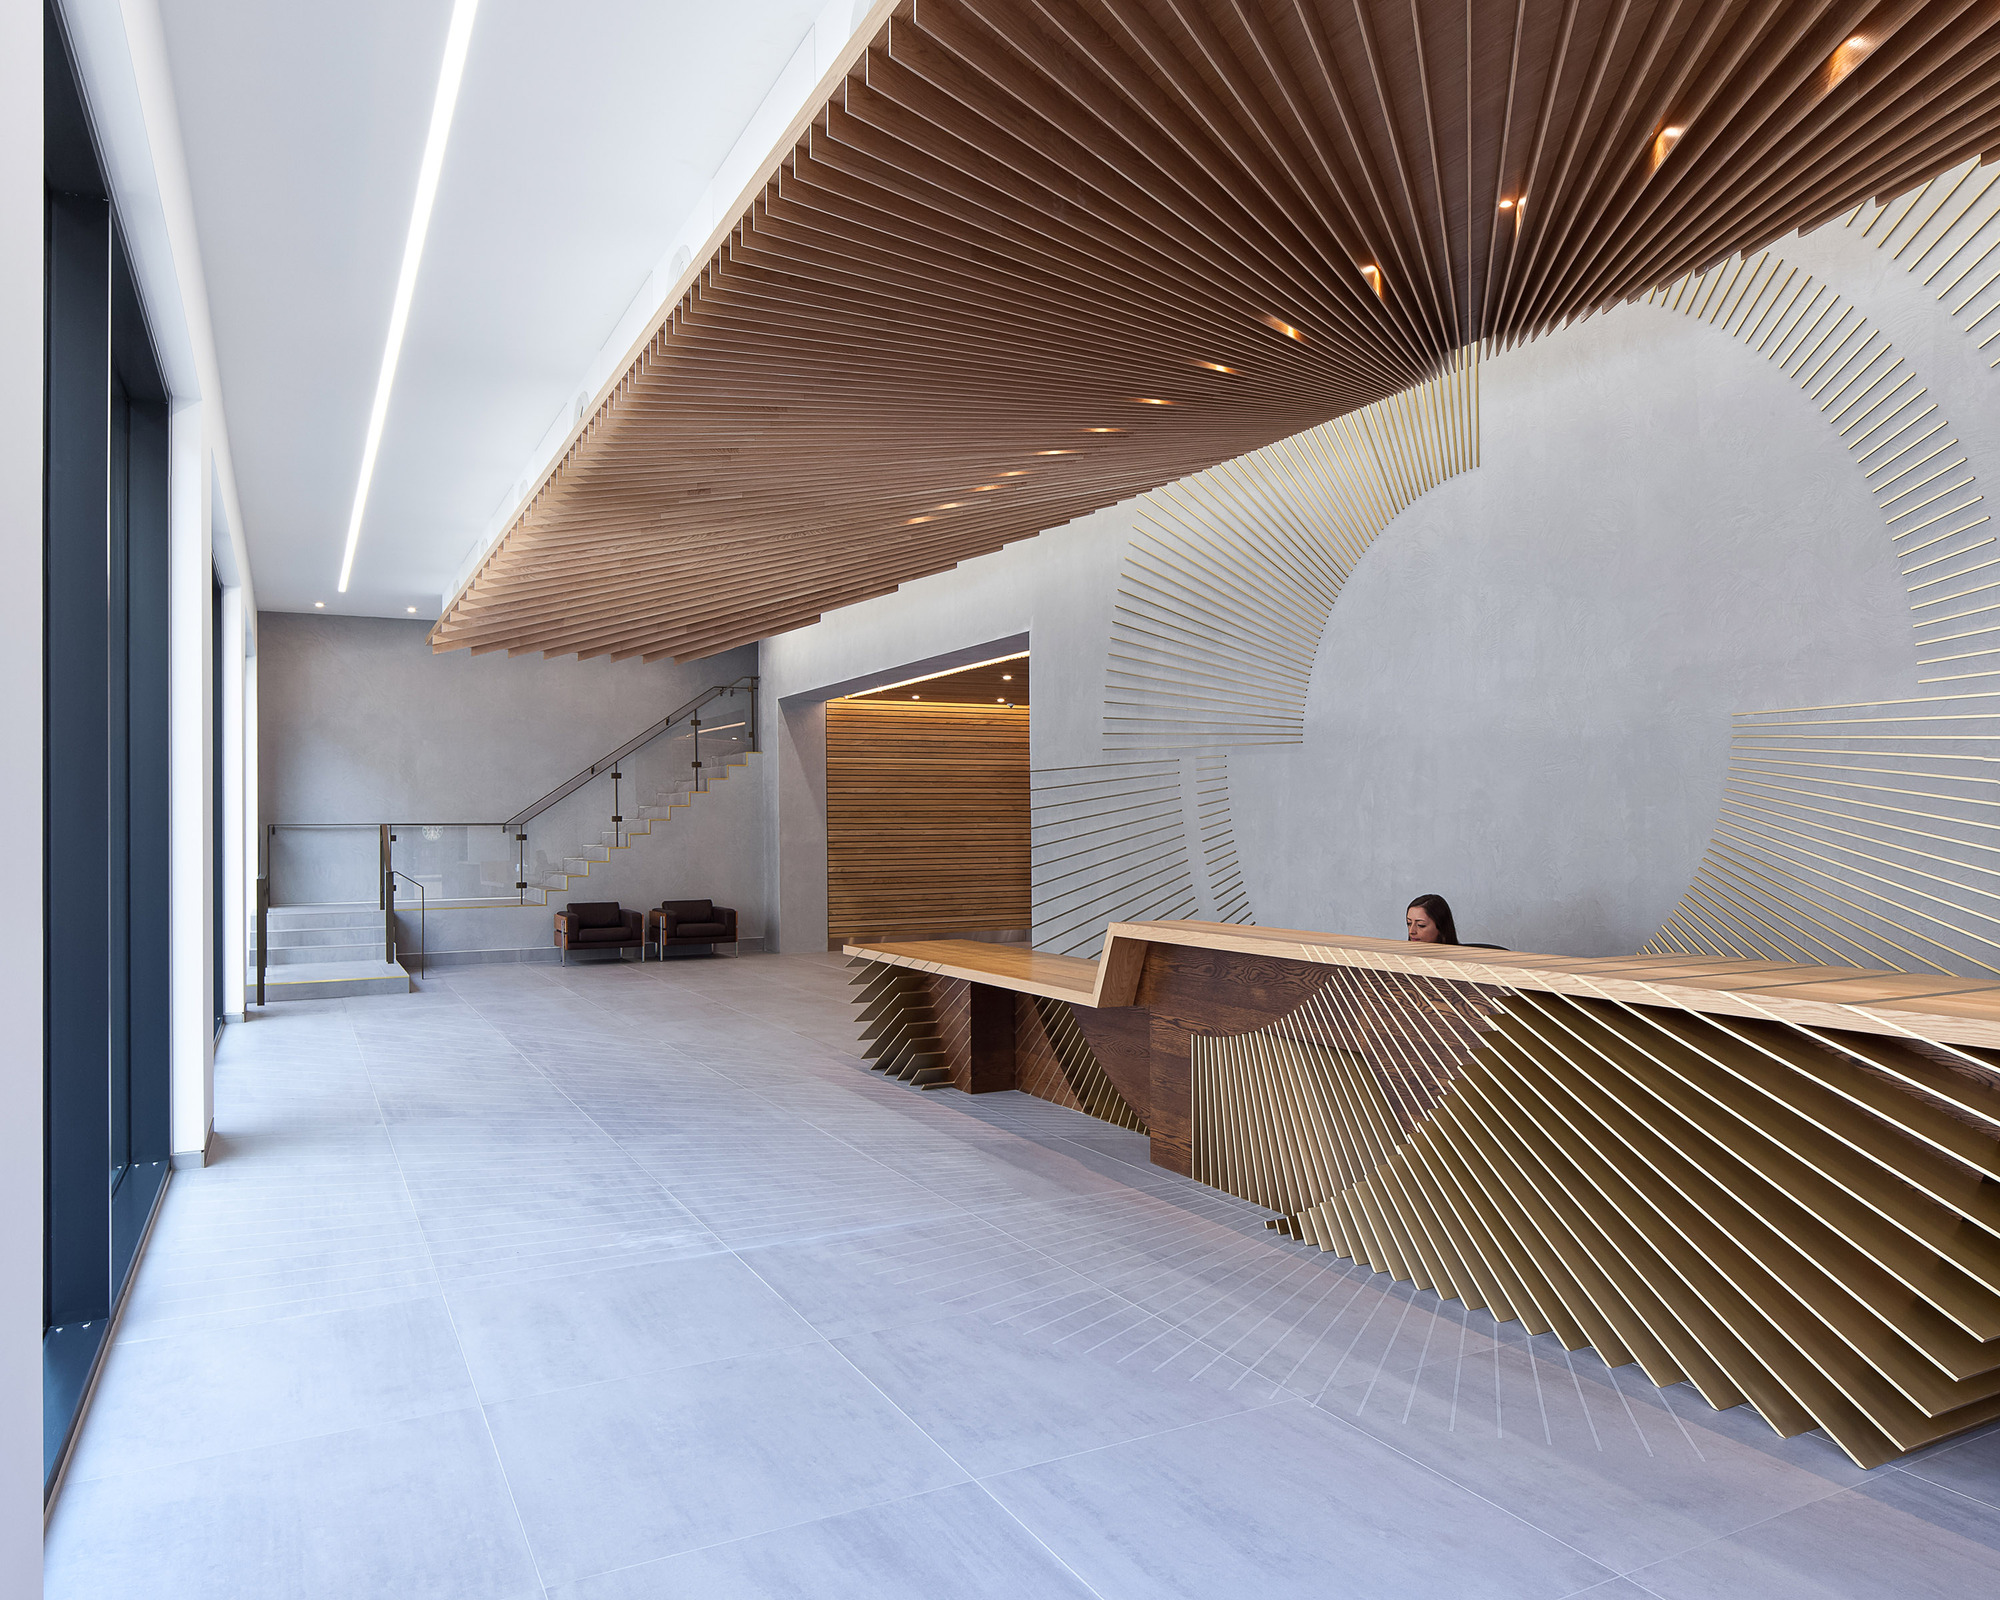 Galer a de edificio ampersand darling associates 4 for 4 design hotel saccharum